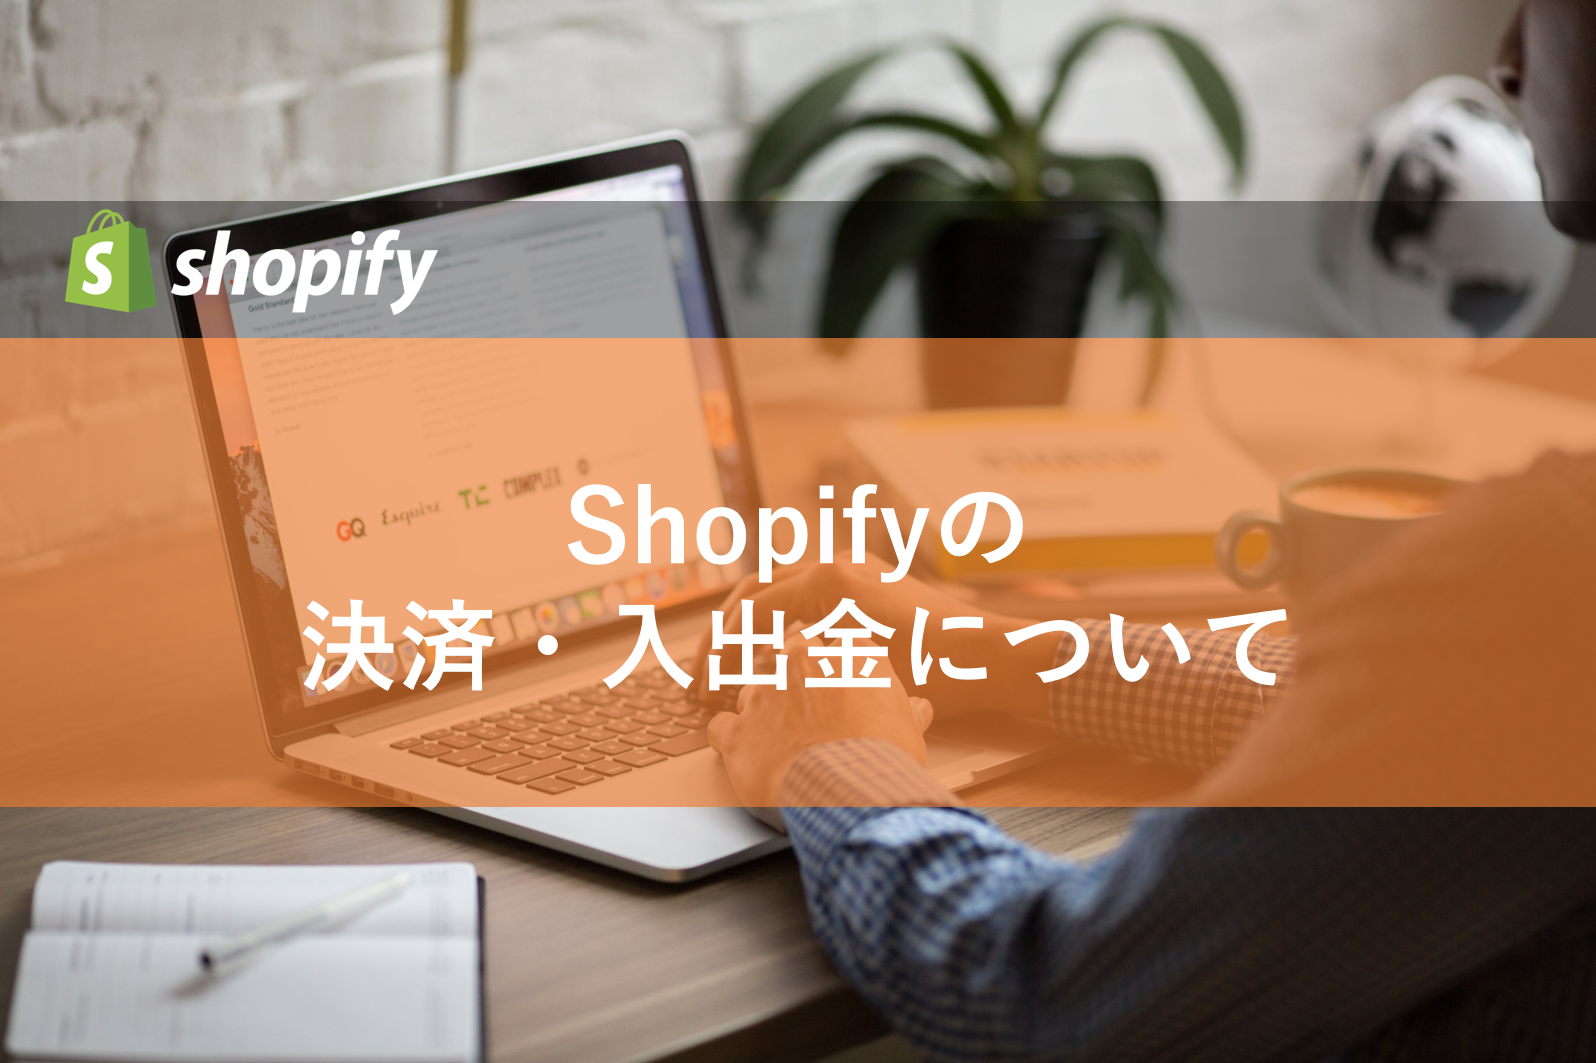 Shopify(ショッピファイ)の使用料金まとめ。決済手数料や月額の利用料金、入金サイクルをチェックしよう。